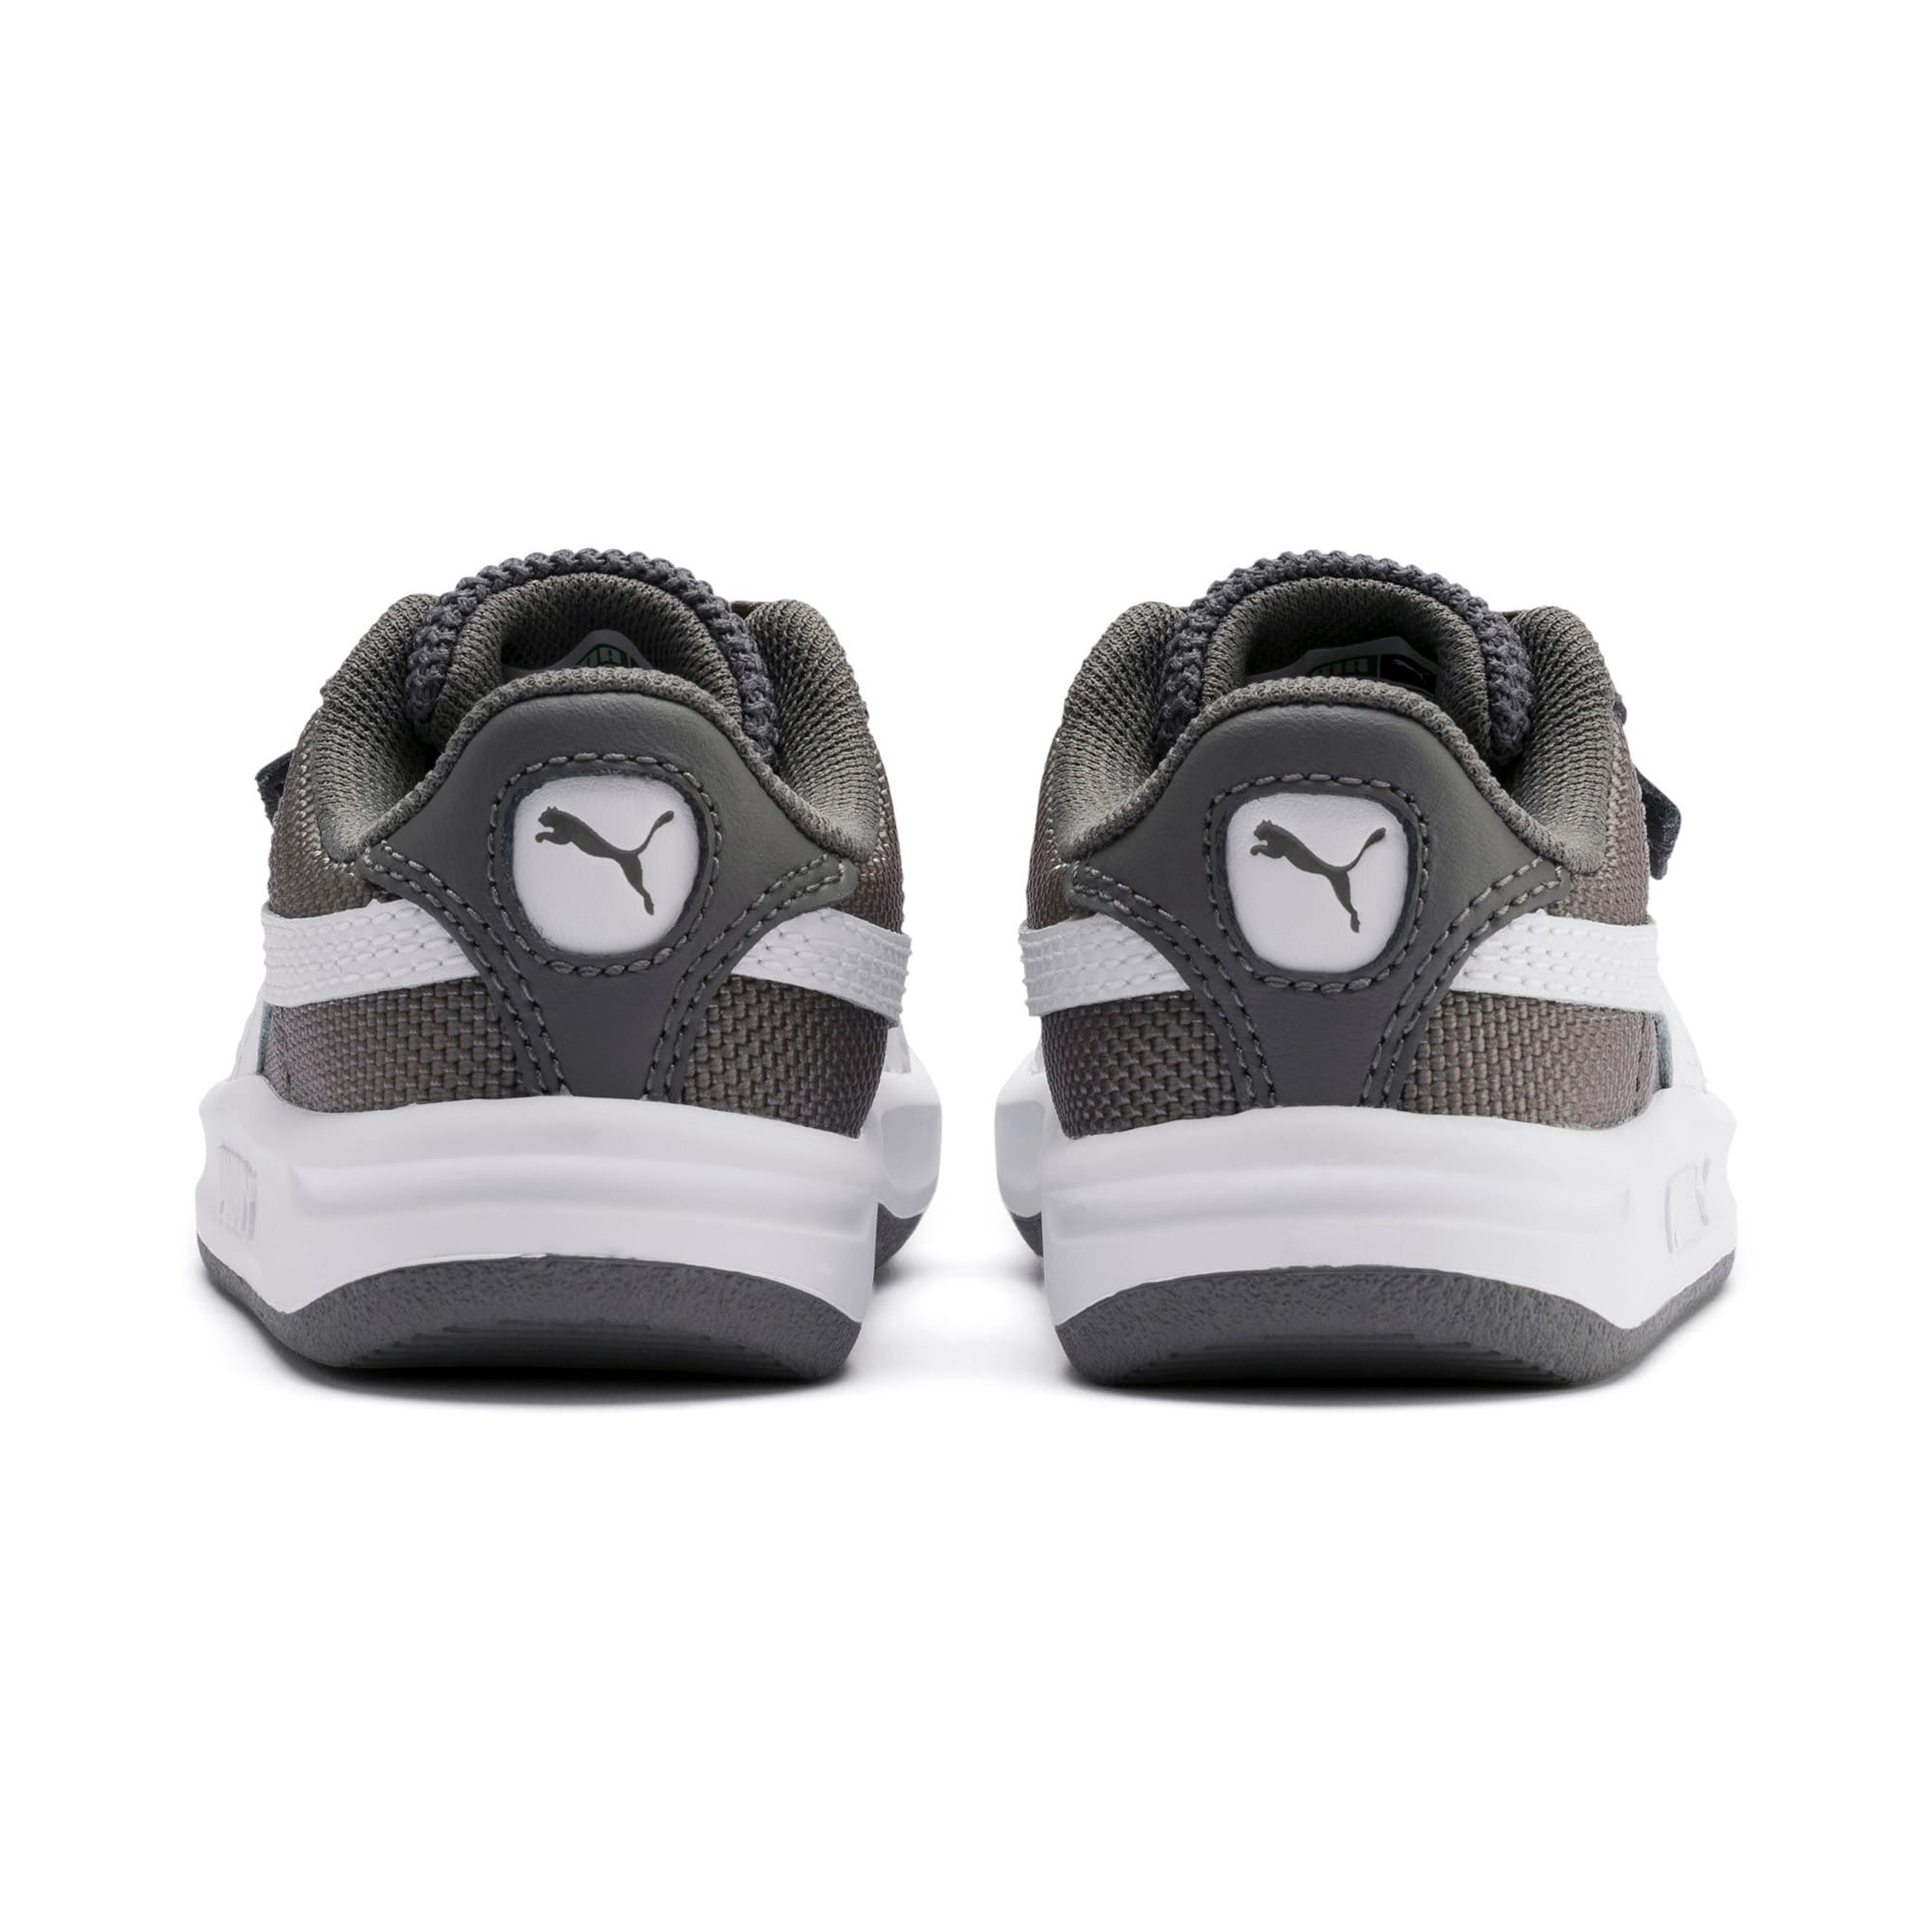 Thumbnail 3 of California Toddler Shoes, CASTLEROCK-Puma White, medium